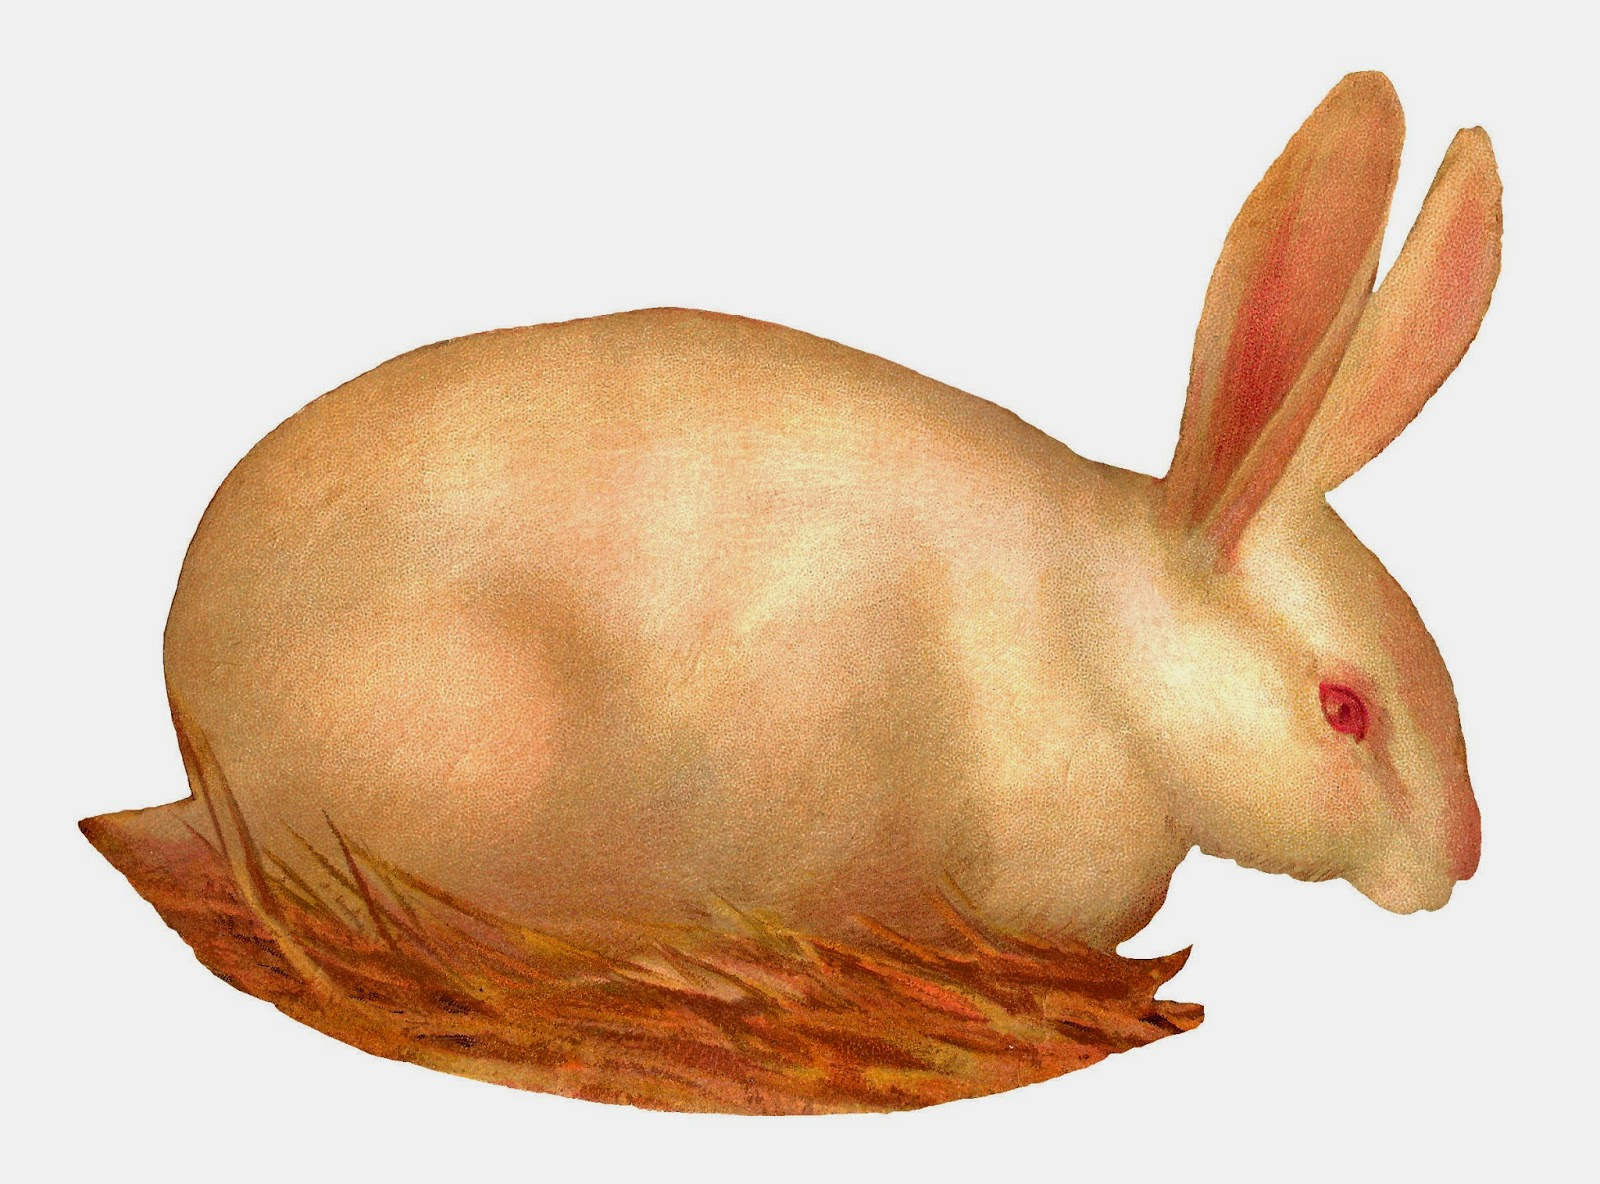 http://3.bp.blogspot.com/-NCp_cwGAkOY/VOteord89fI/AAAAAAAAVqE/21aL0qcmt1E/s1600/scrap_rabbit_wht_2-2.jpg